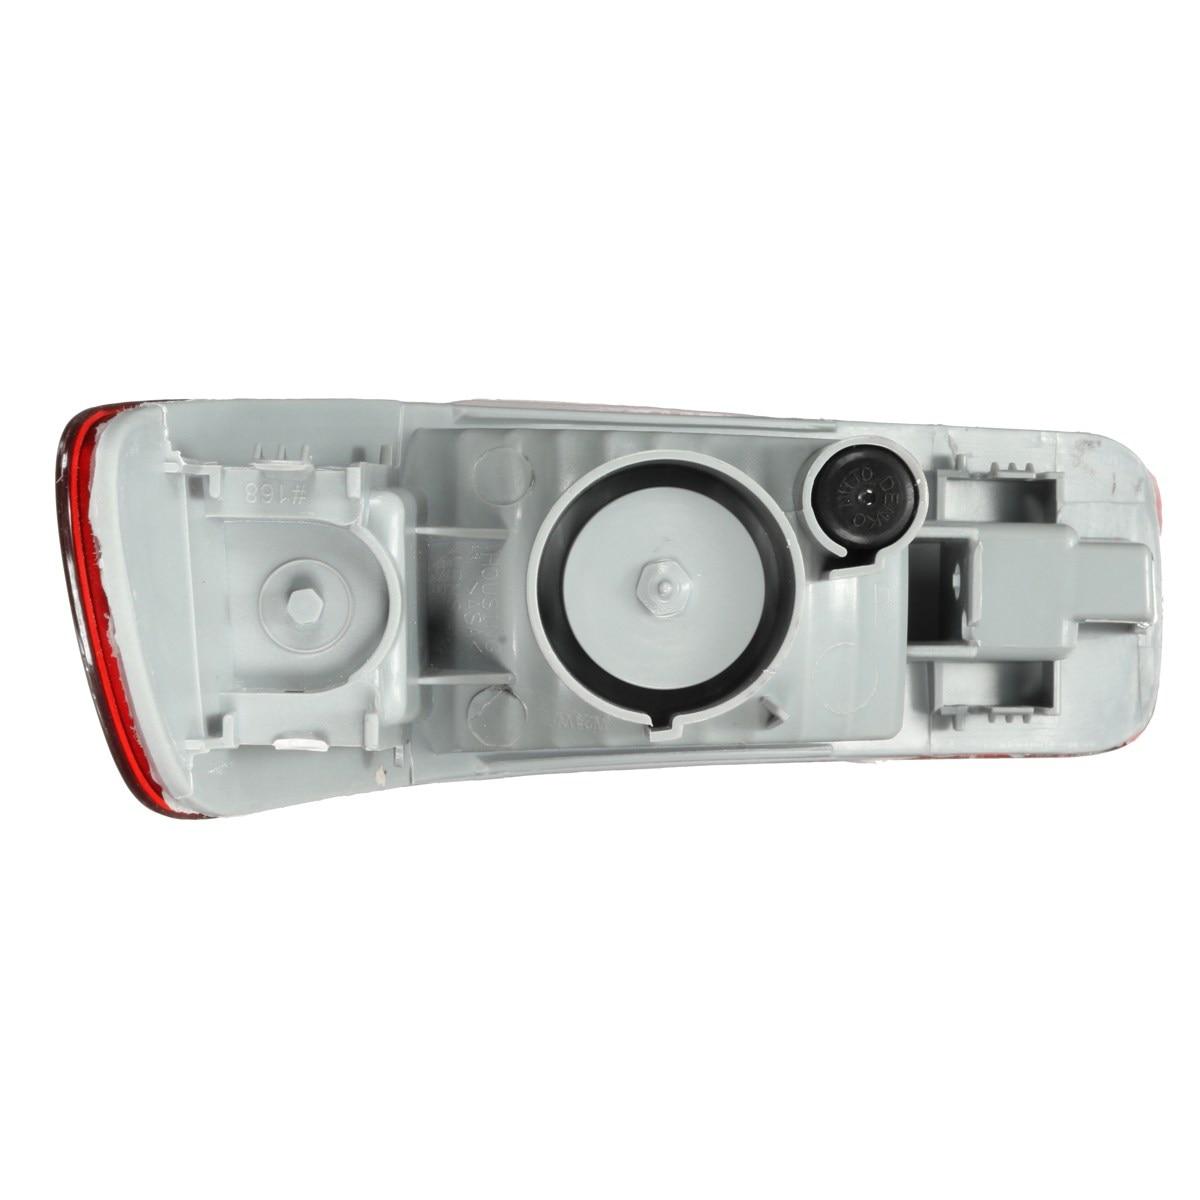 1Pcs Car Rear Right/Left Tail Fog Light Warning Lamp For Mitsubish Outlander for Peugeot for Citroen 07-12